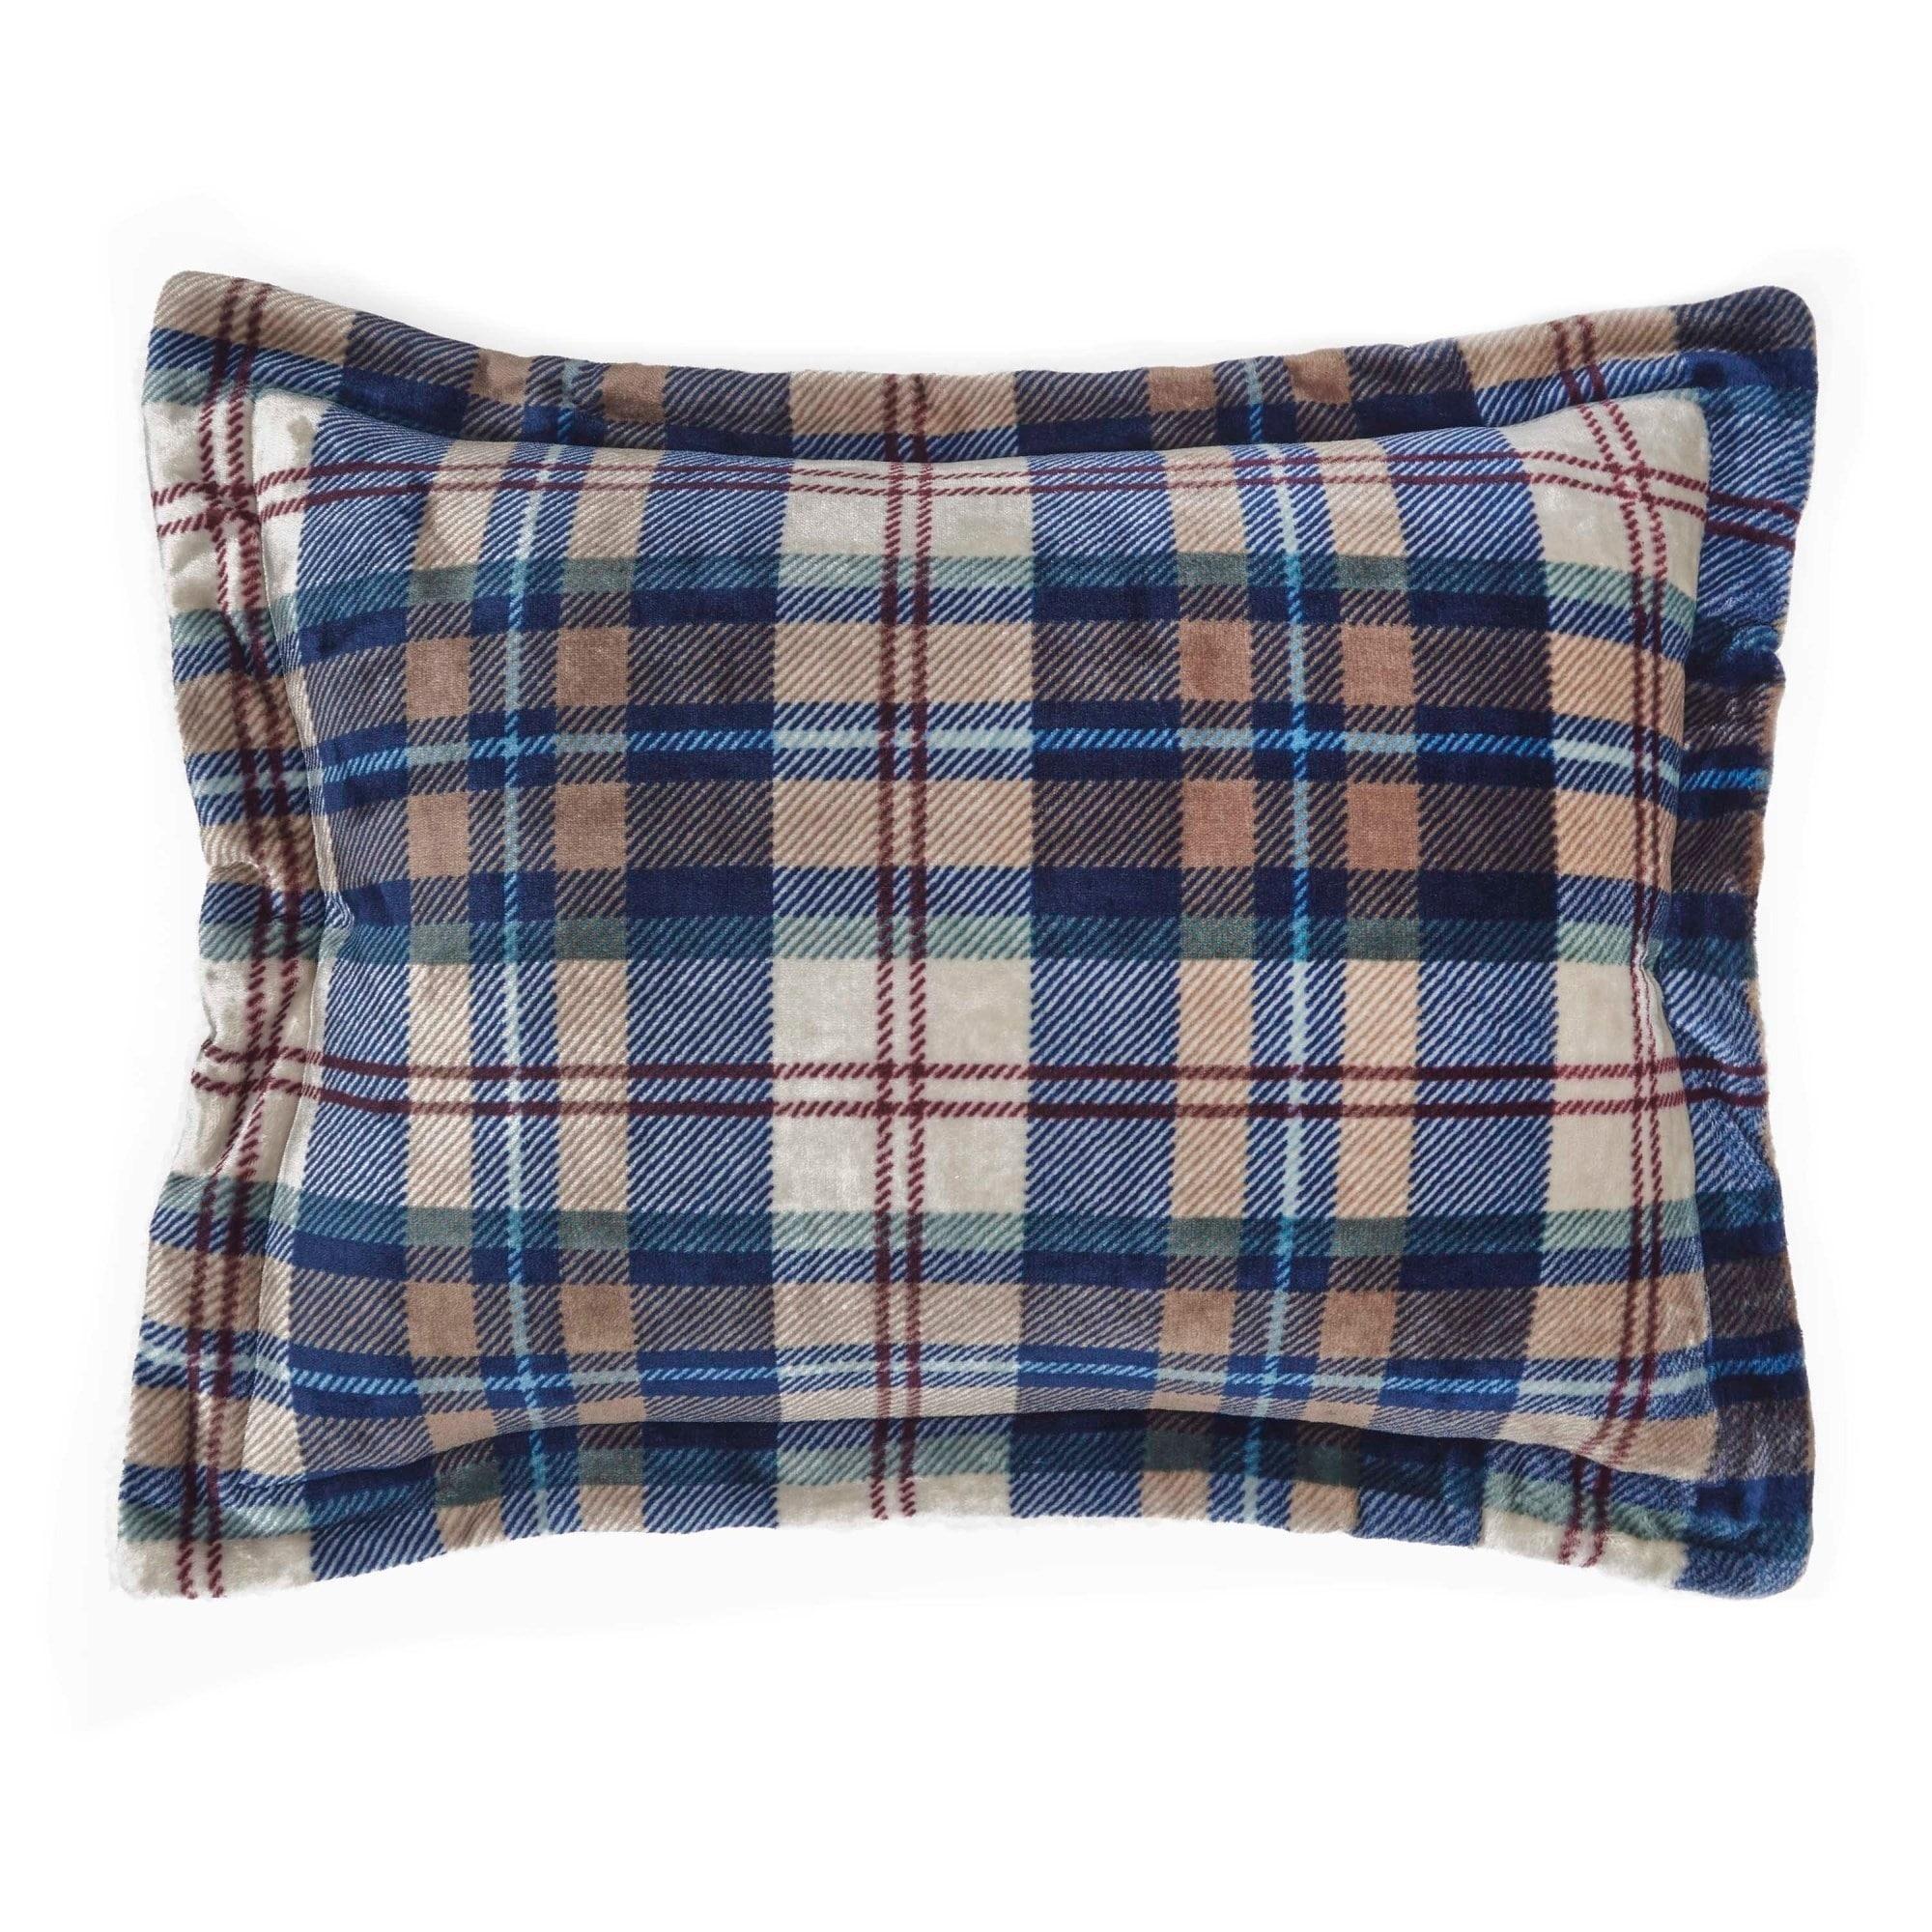 Vellux Ethan Plush Sherpa Plaid Comforter Set Overstock 19628623